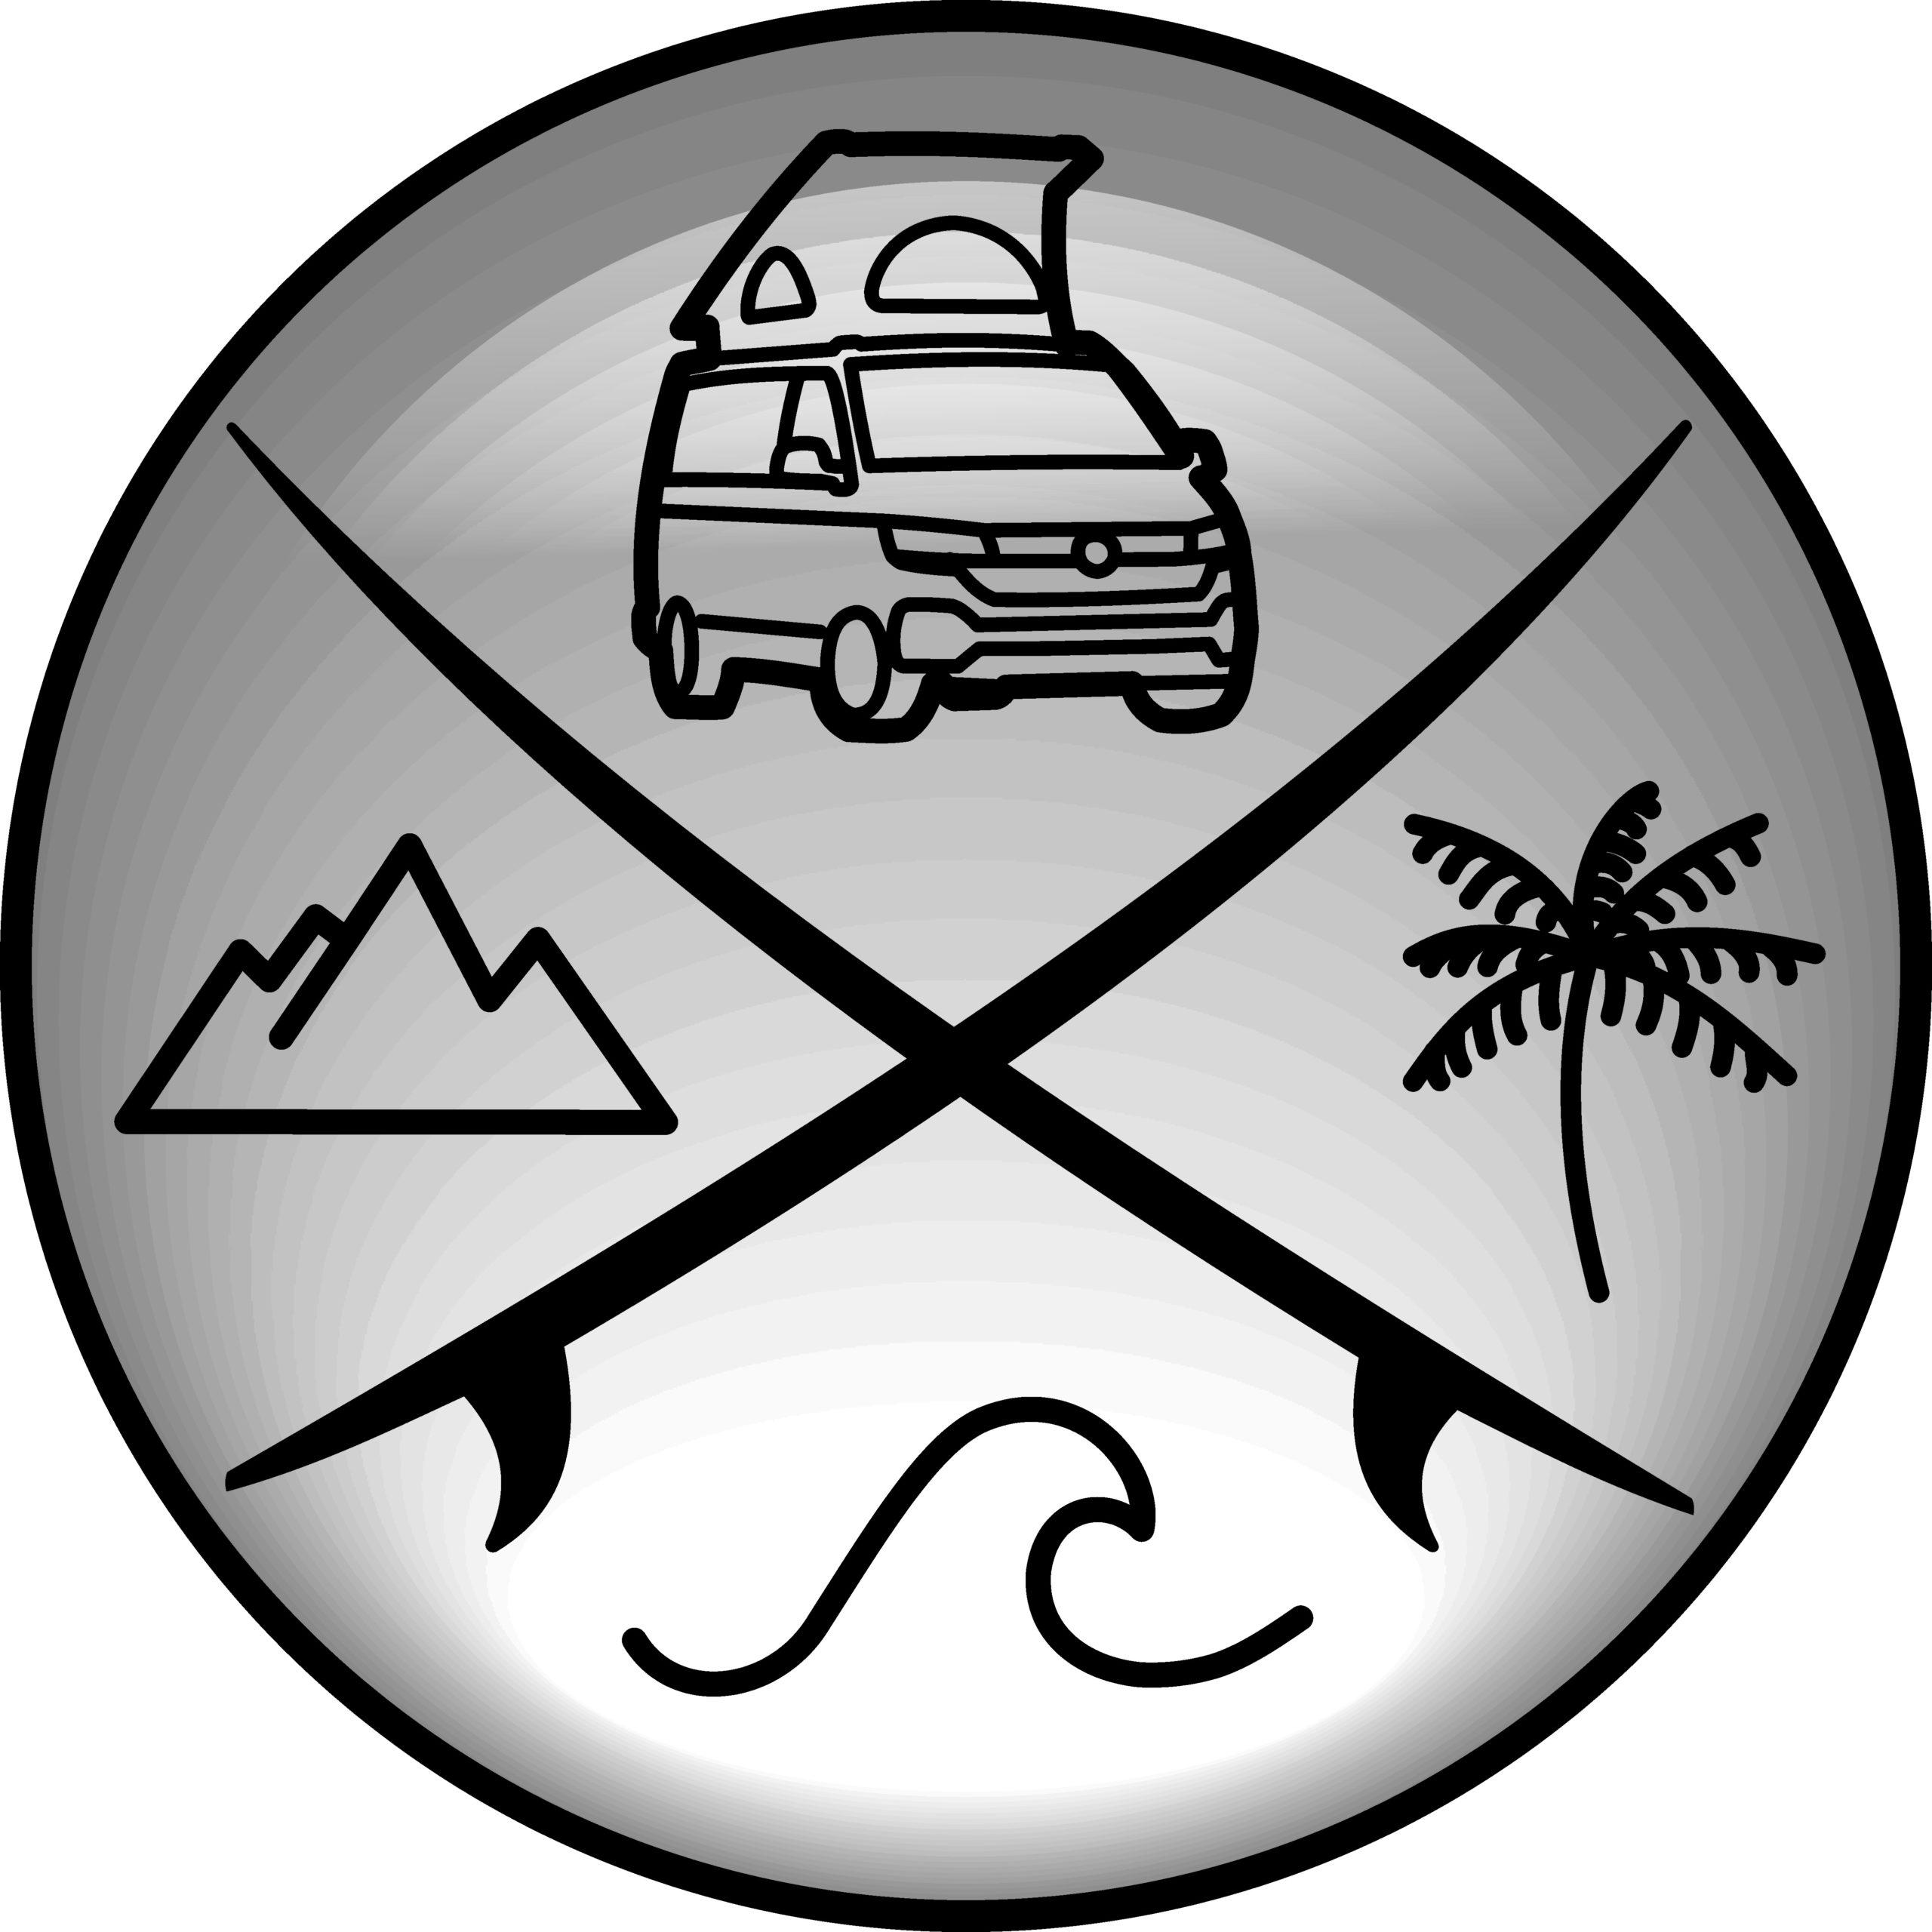 Gruenthal-Mobilcamping